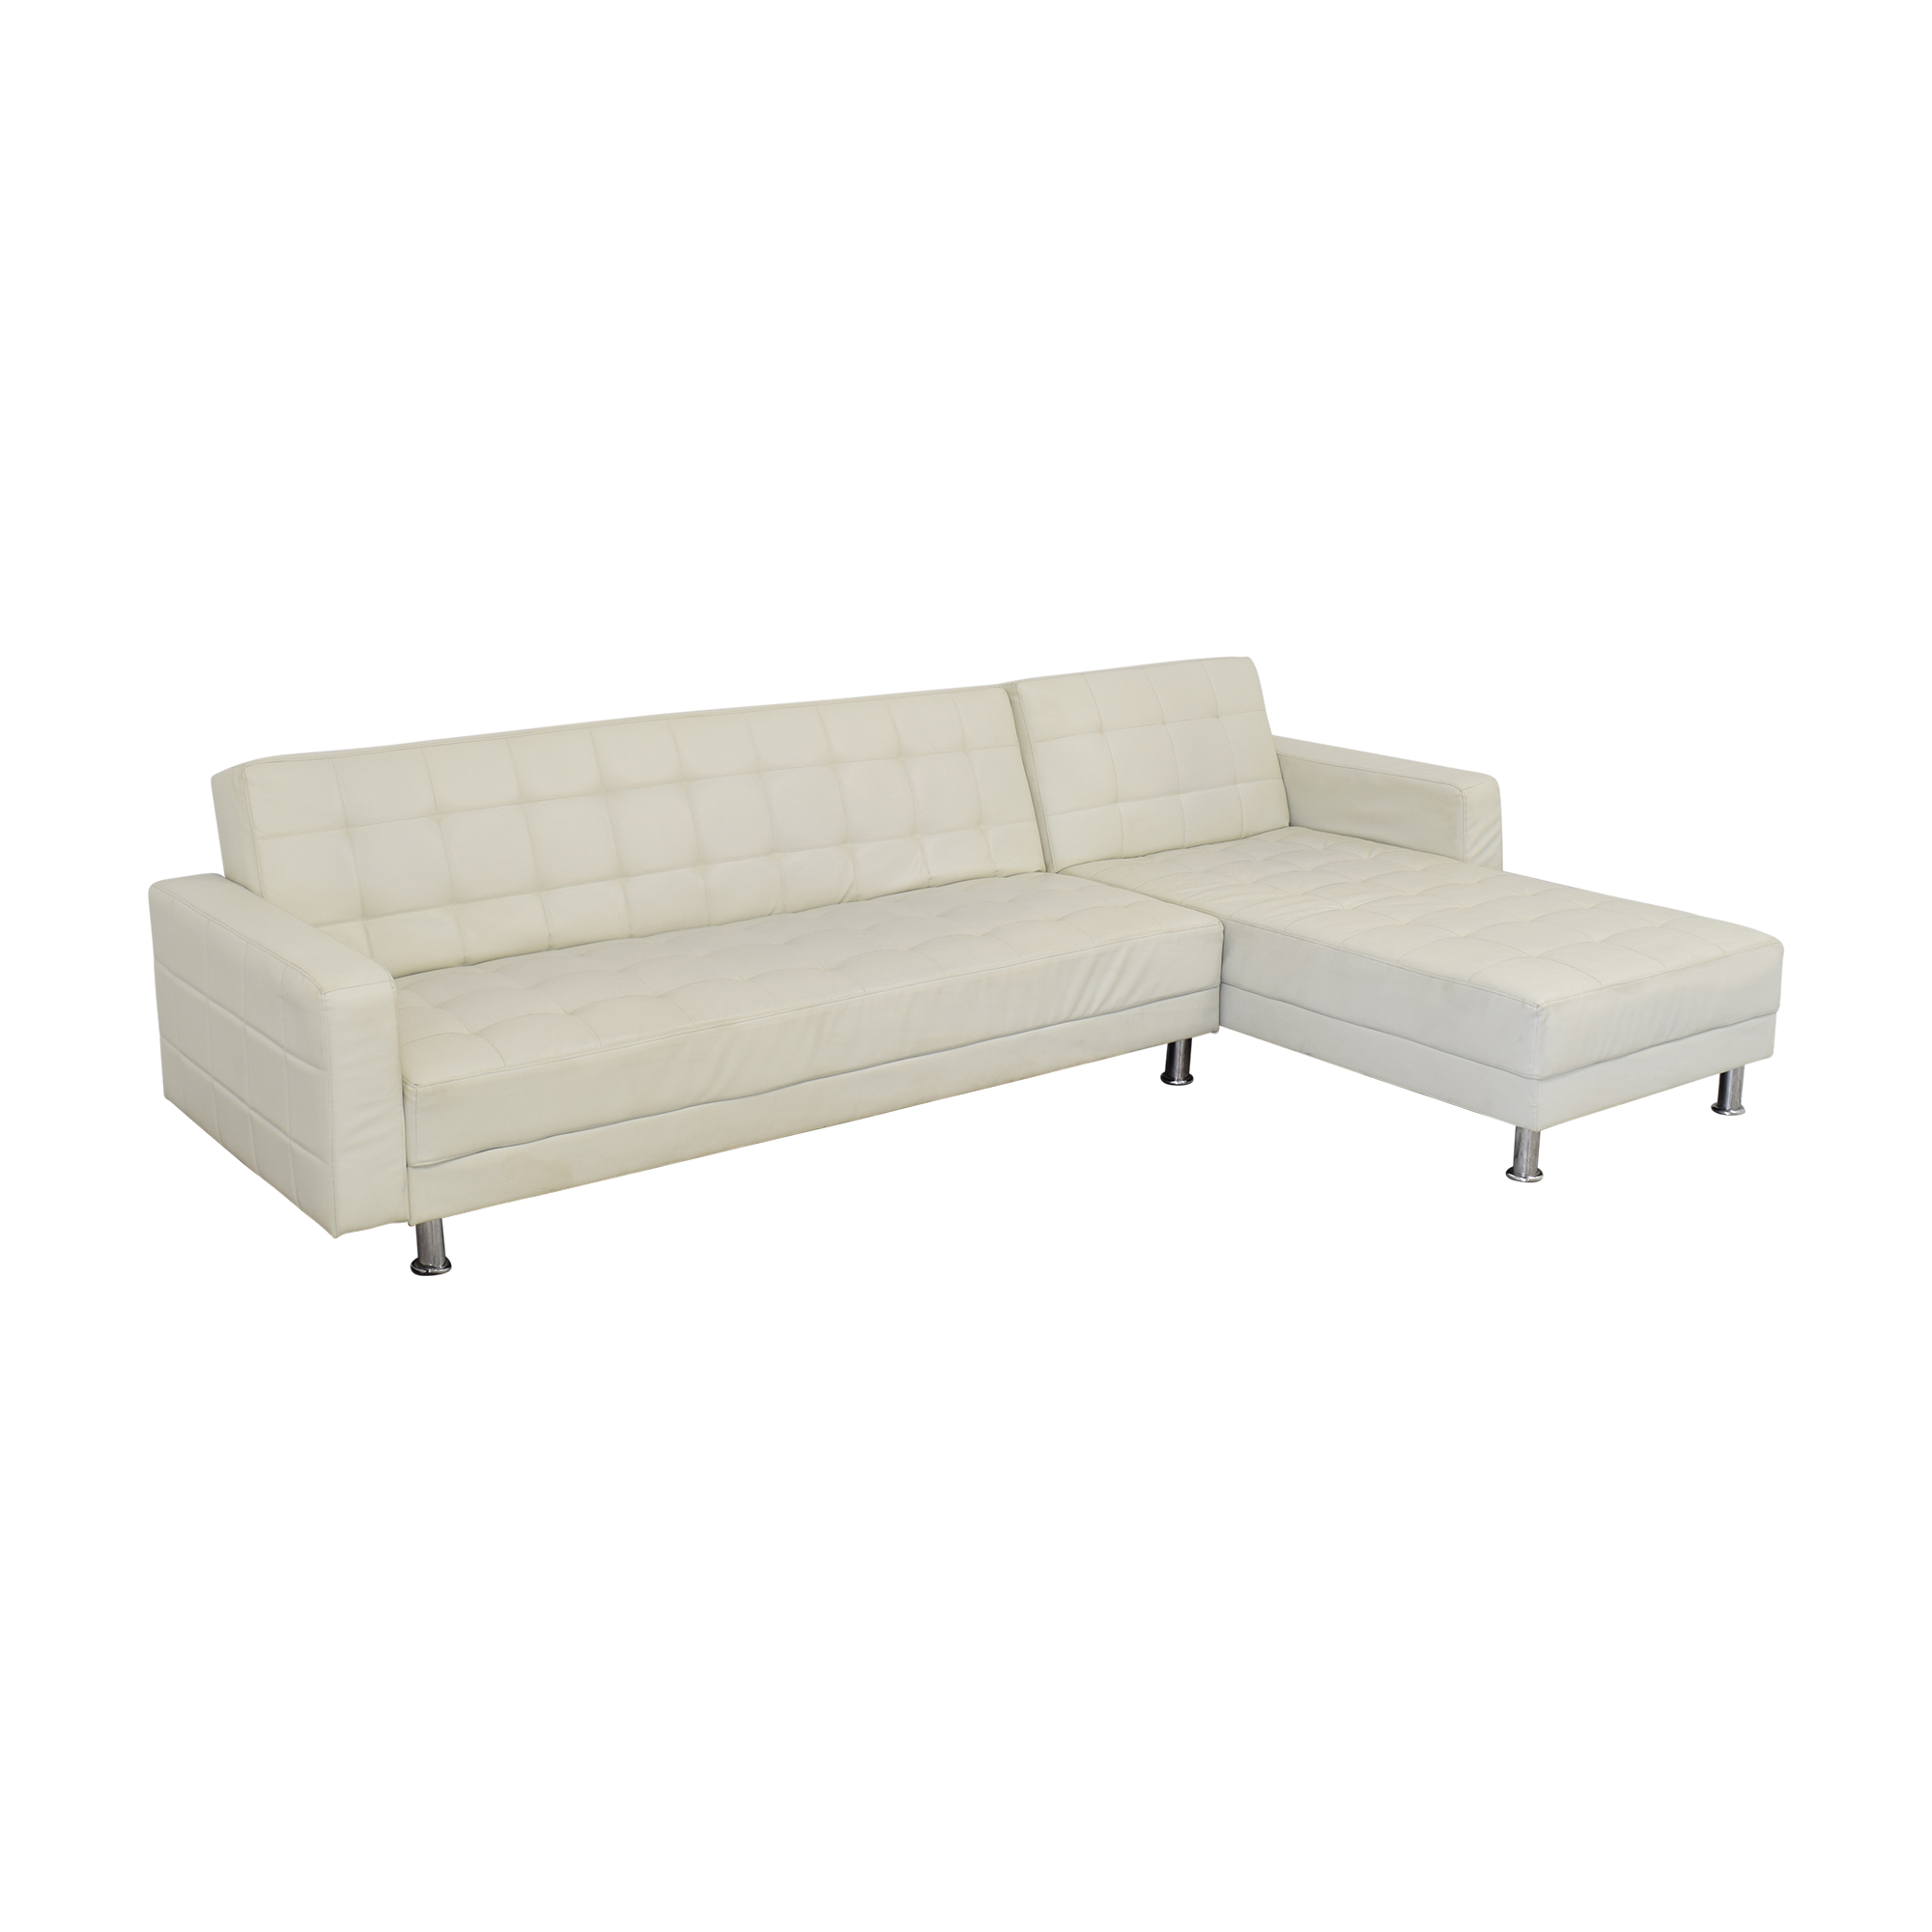 shop Wayfair Wayfair Spirit Lake Sleeper Sectional Sofa online